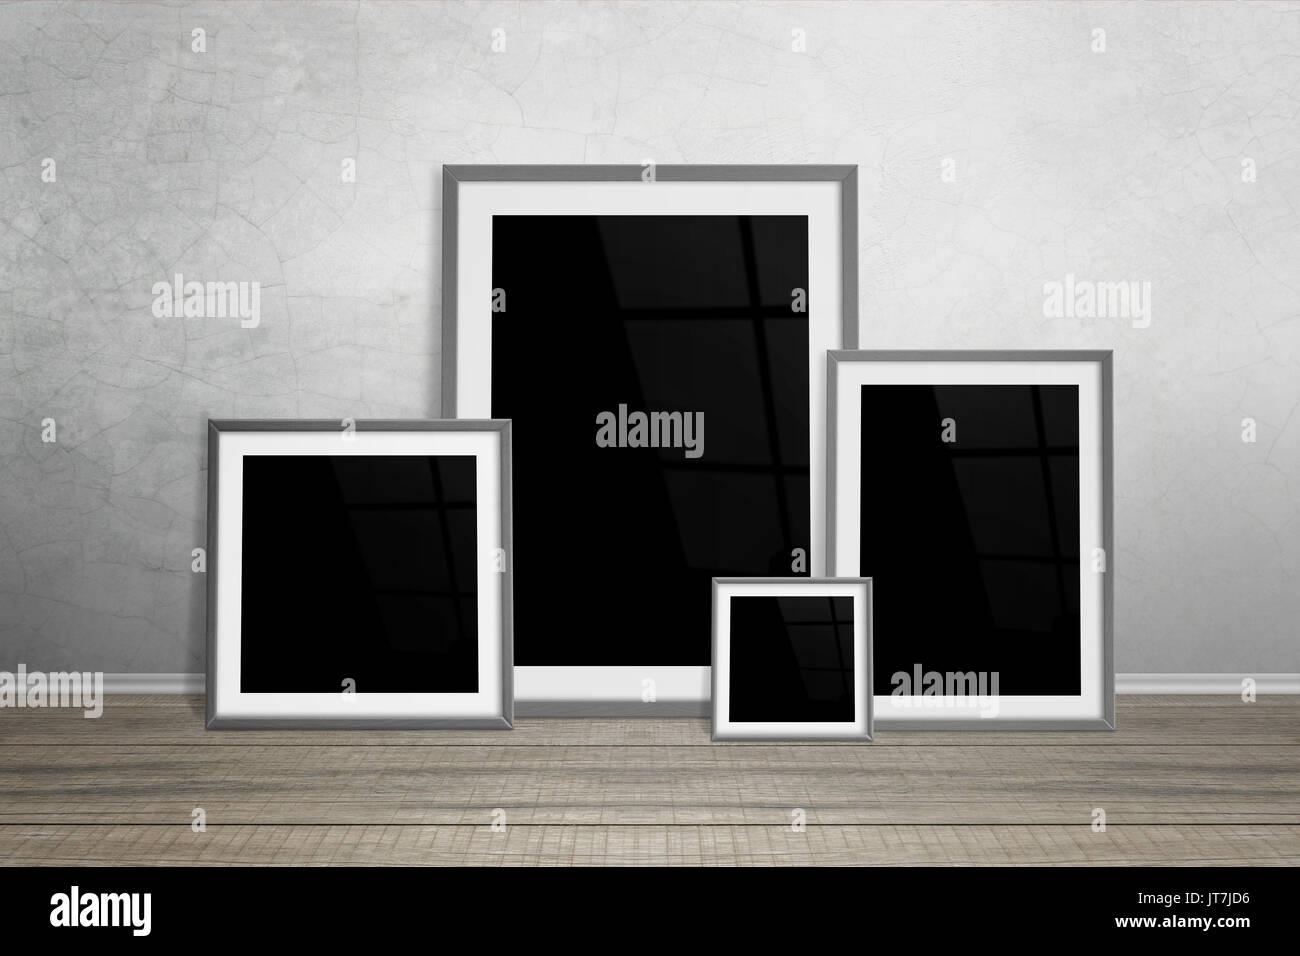 Multiple Frames Stock Photos & Multiple Frames Stock Images - Alamy